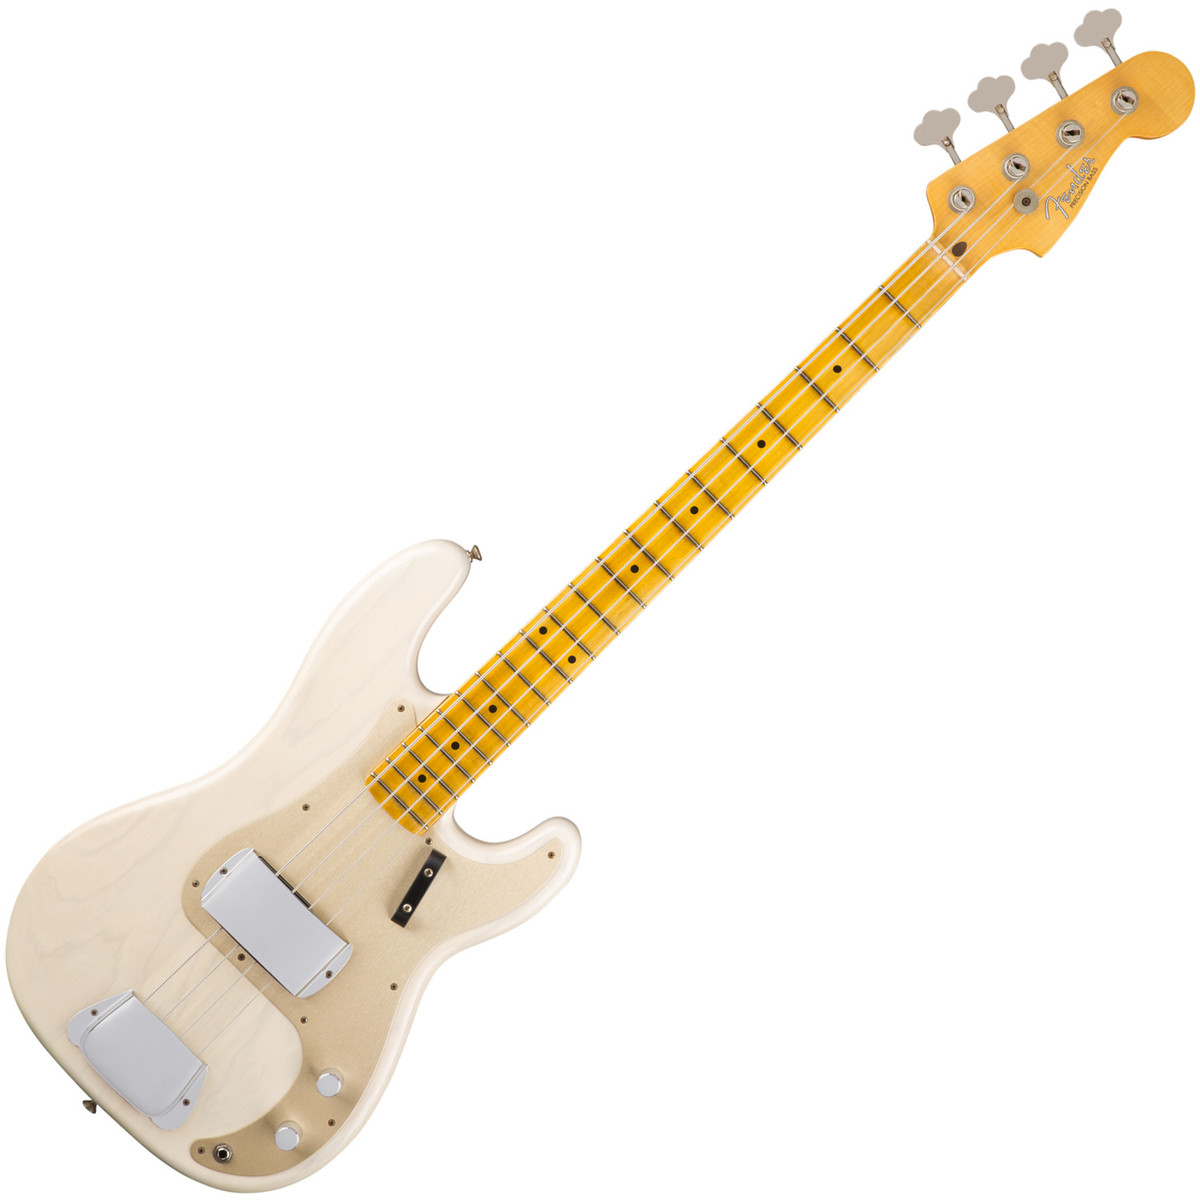 fender custom shop 1957 journeyman relic precision bass white blonde at. Black Bedroom Furniture Sets. Home Design Ideas